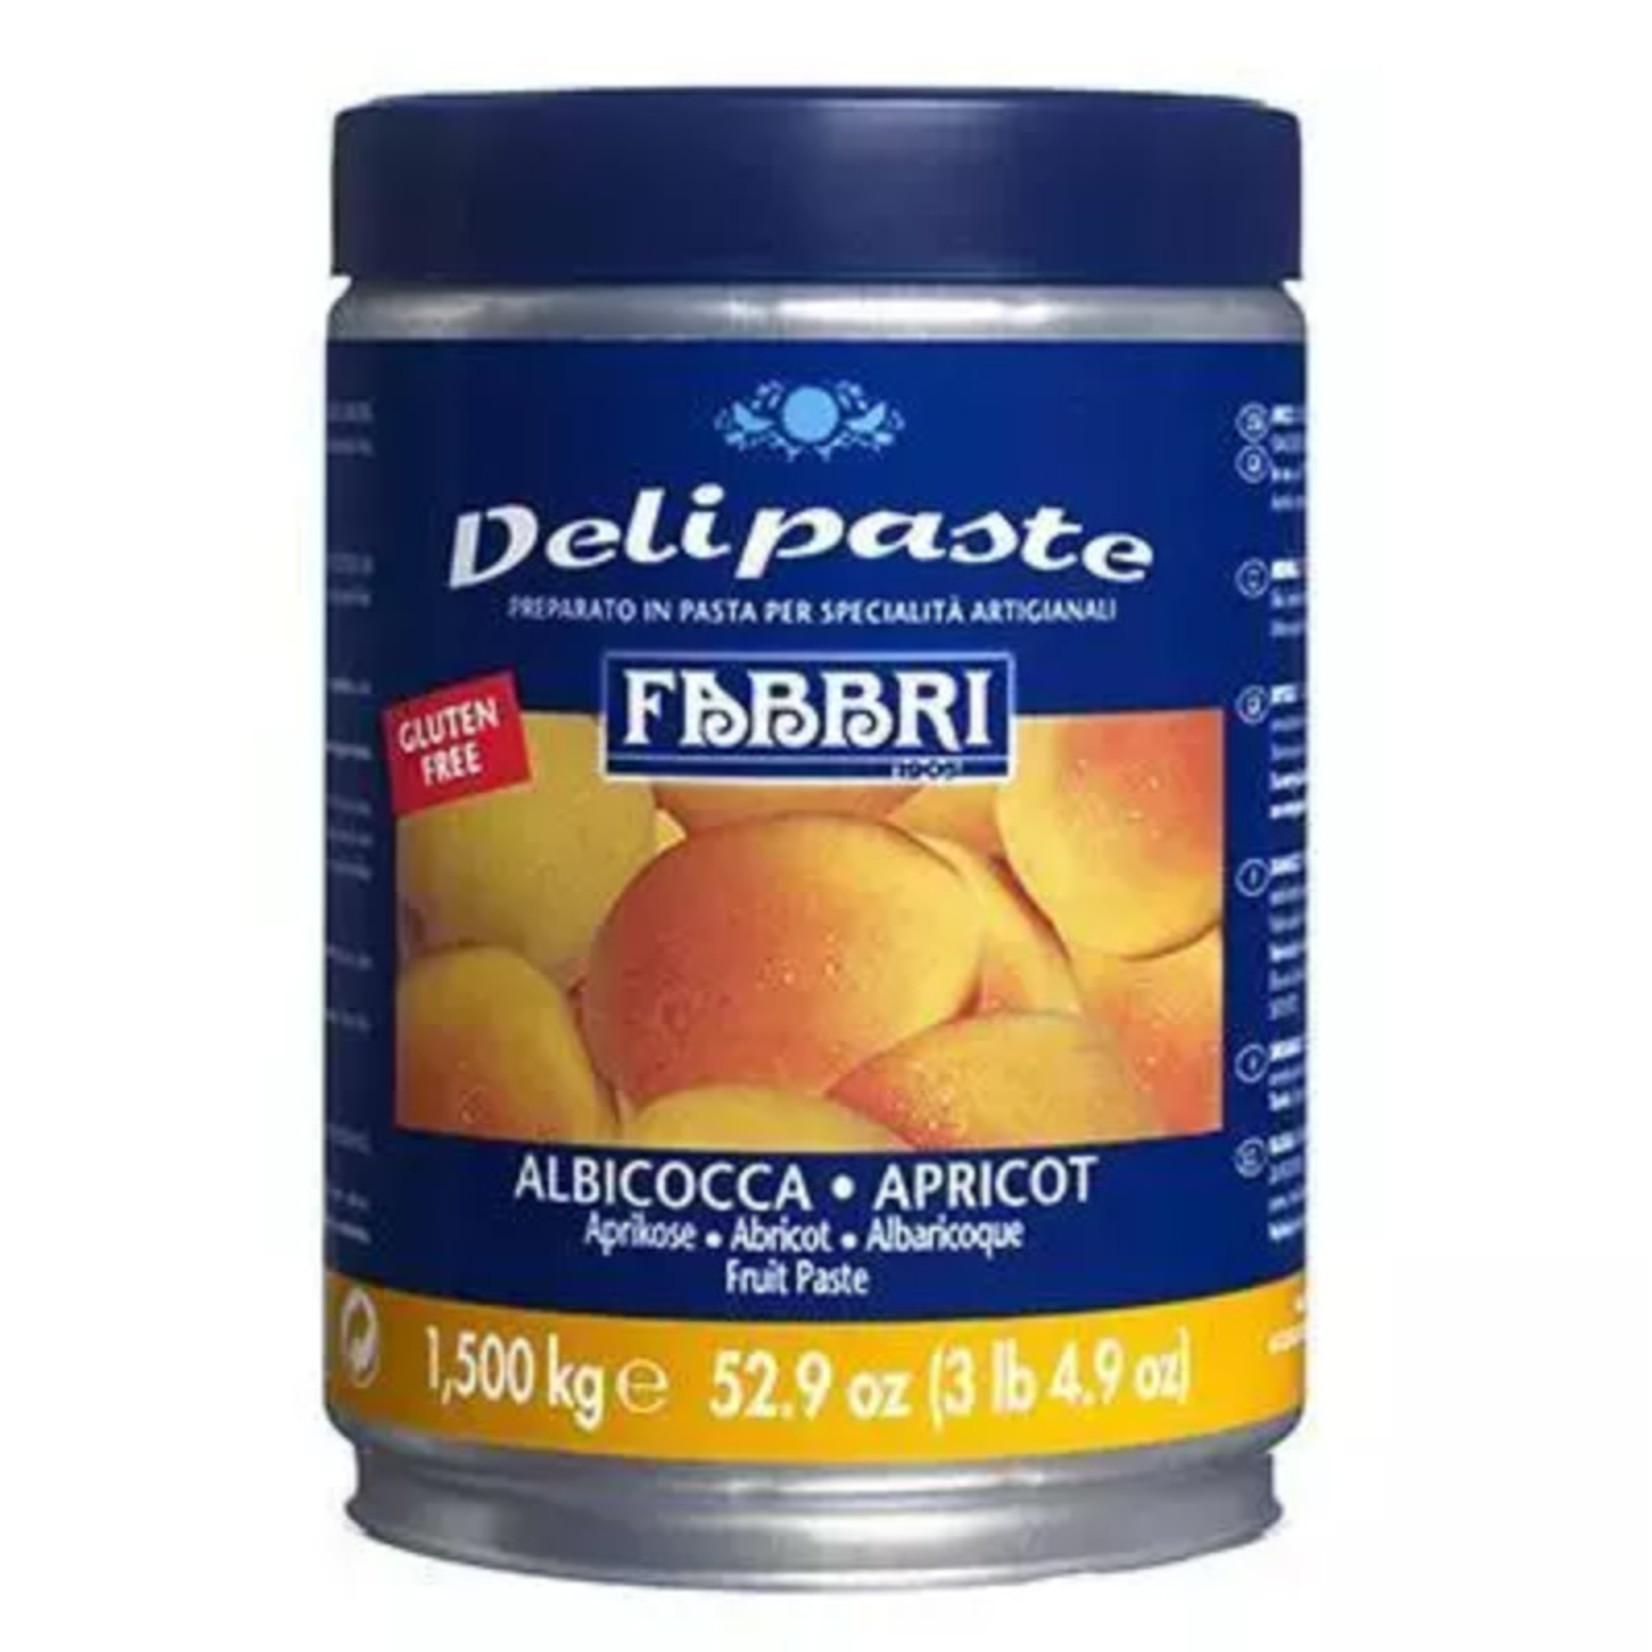 Fabbri Fabbri - Apricot Delipaste - 1.5kg, 9225753-23N